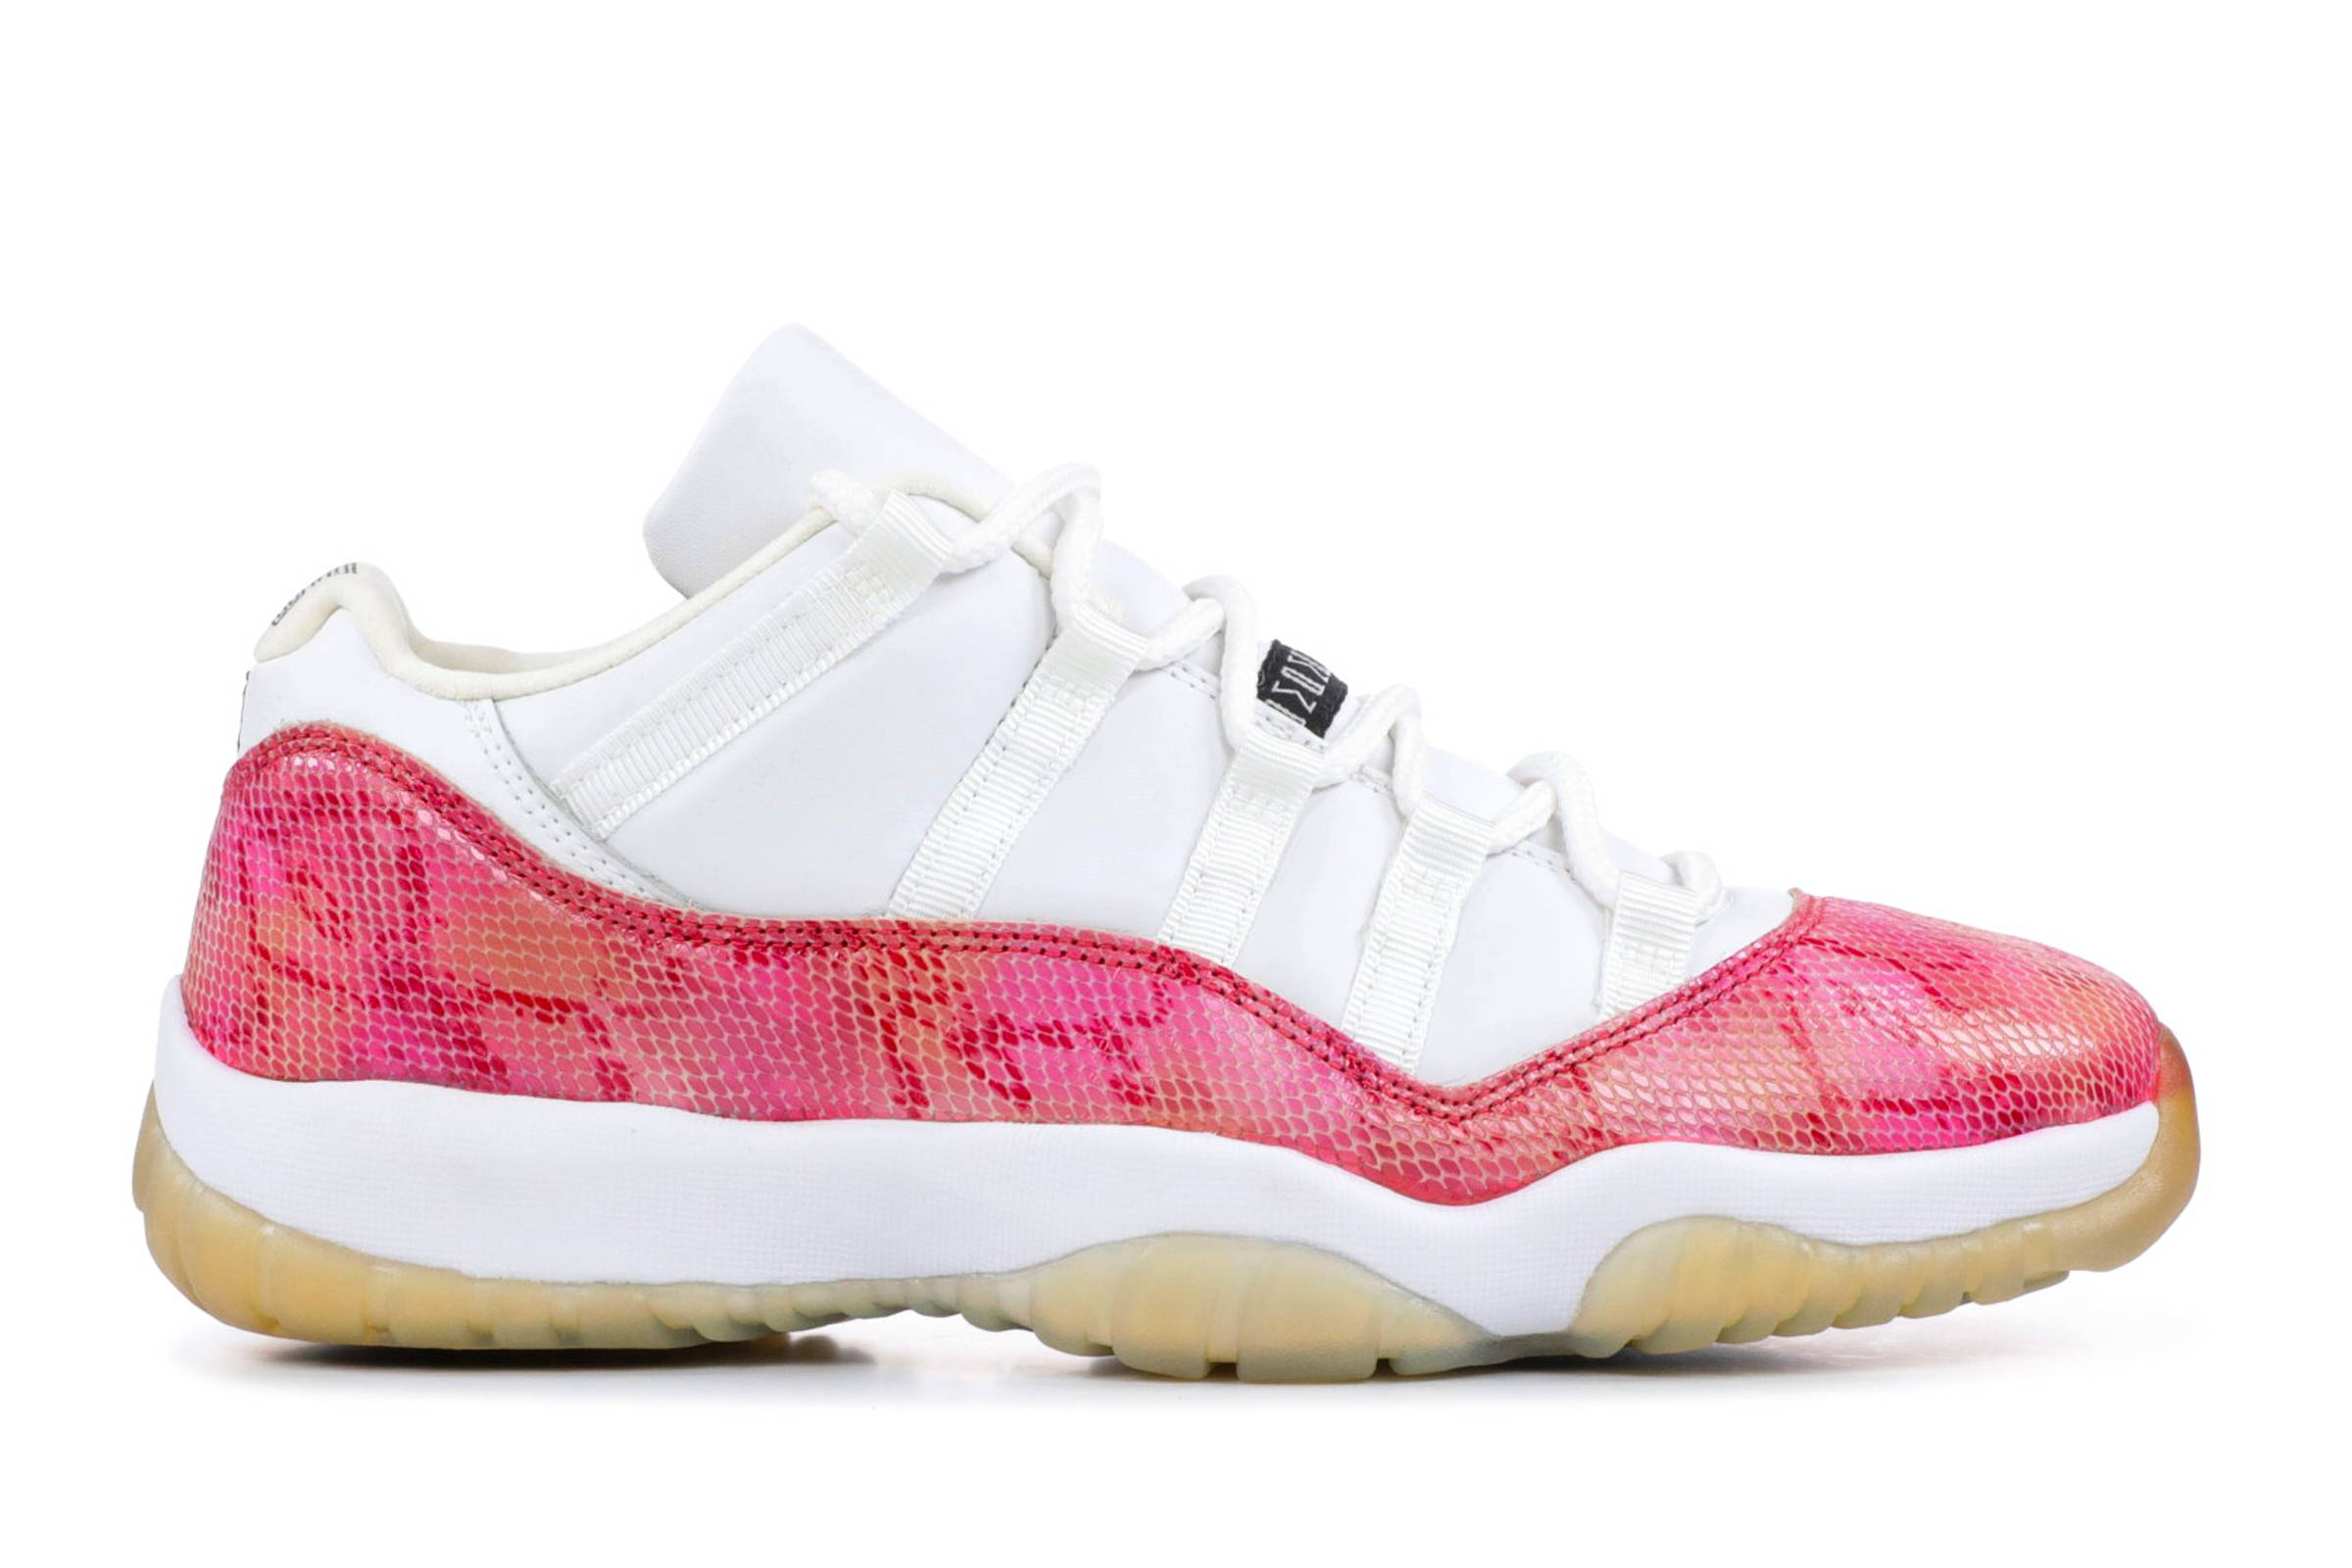 air jordan 11 retro low pink snakeskin